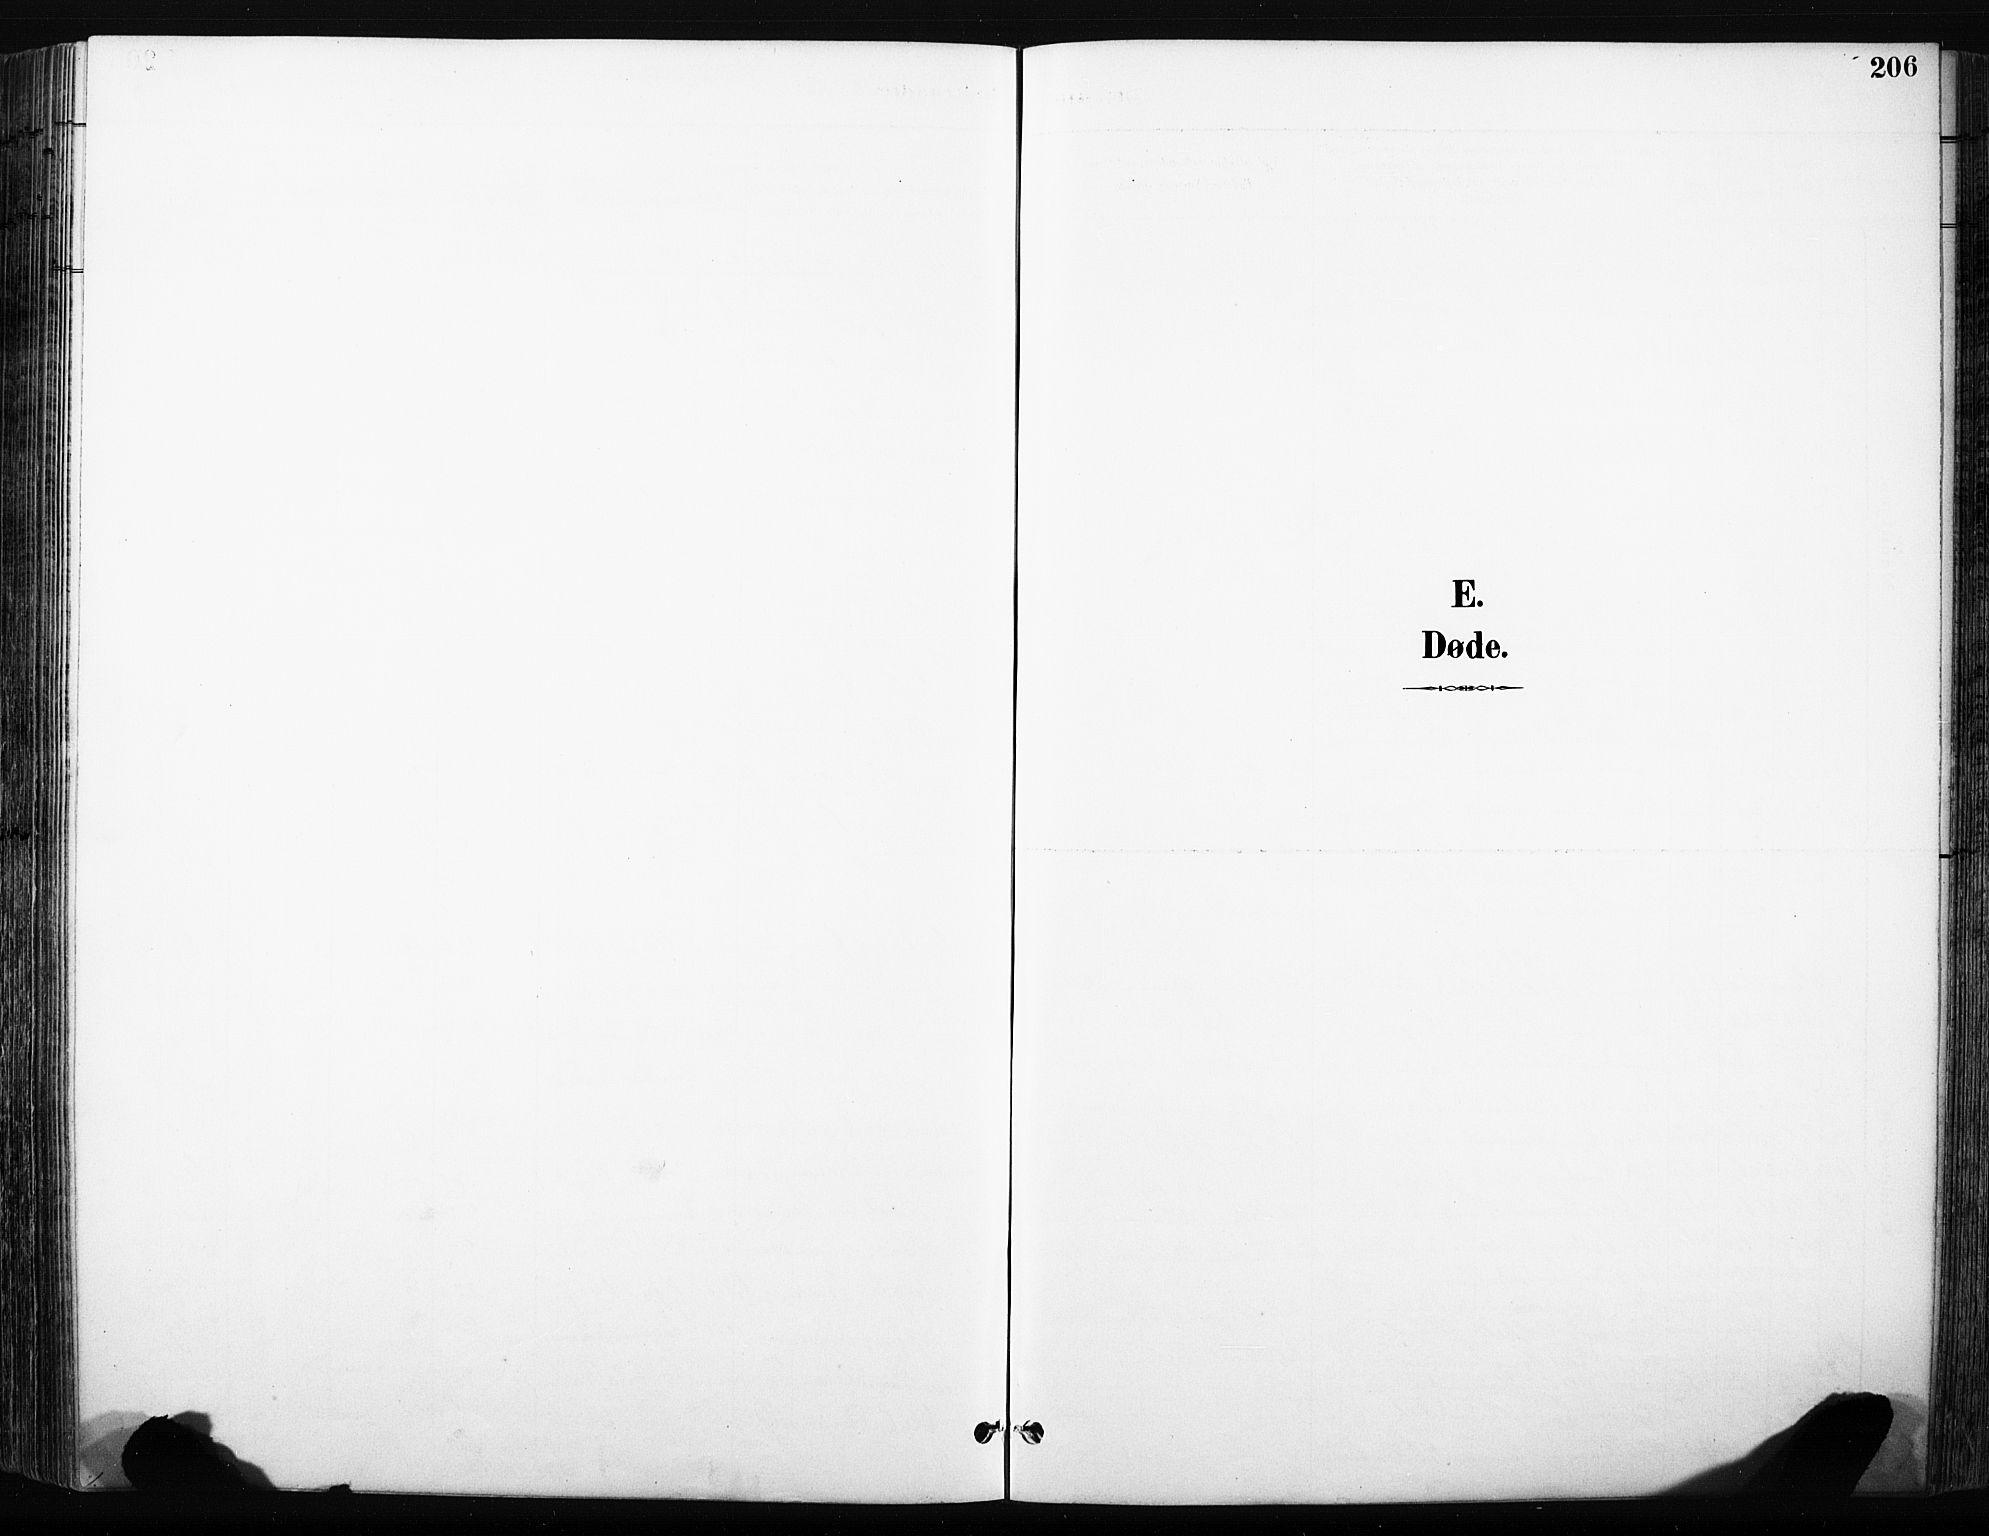 SAH, Skjåk prestekontor, Klokkerbok nr. 3, 1893-1932, s. 206